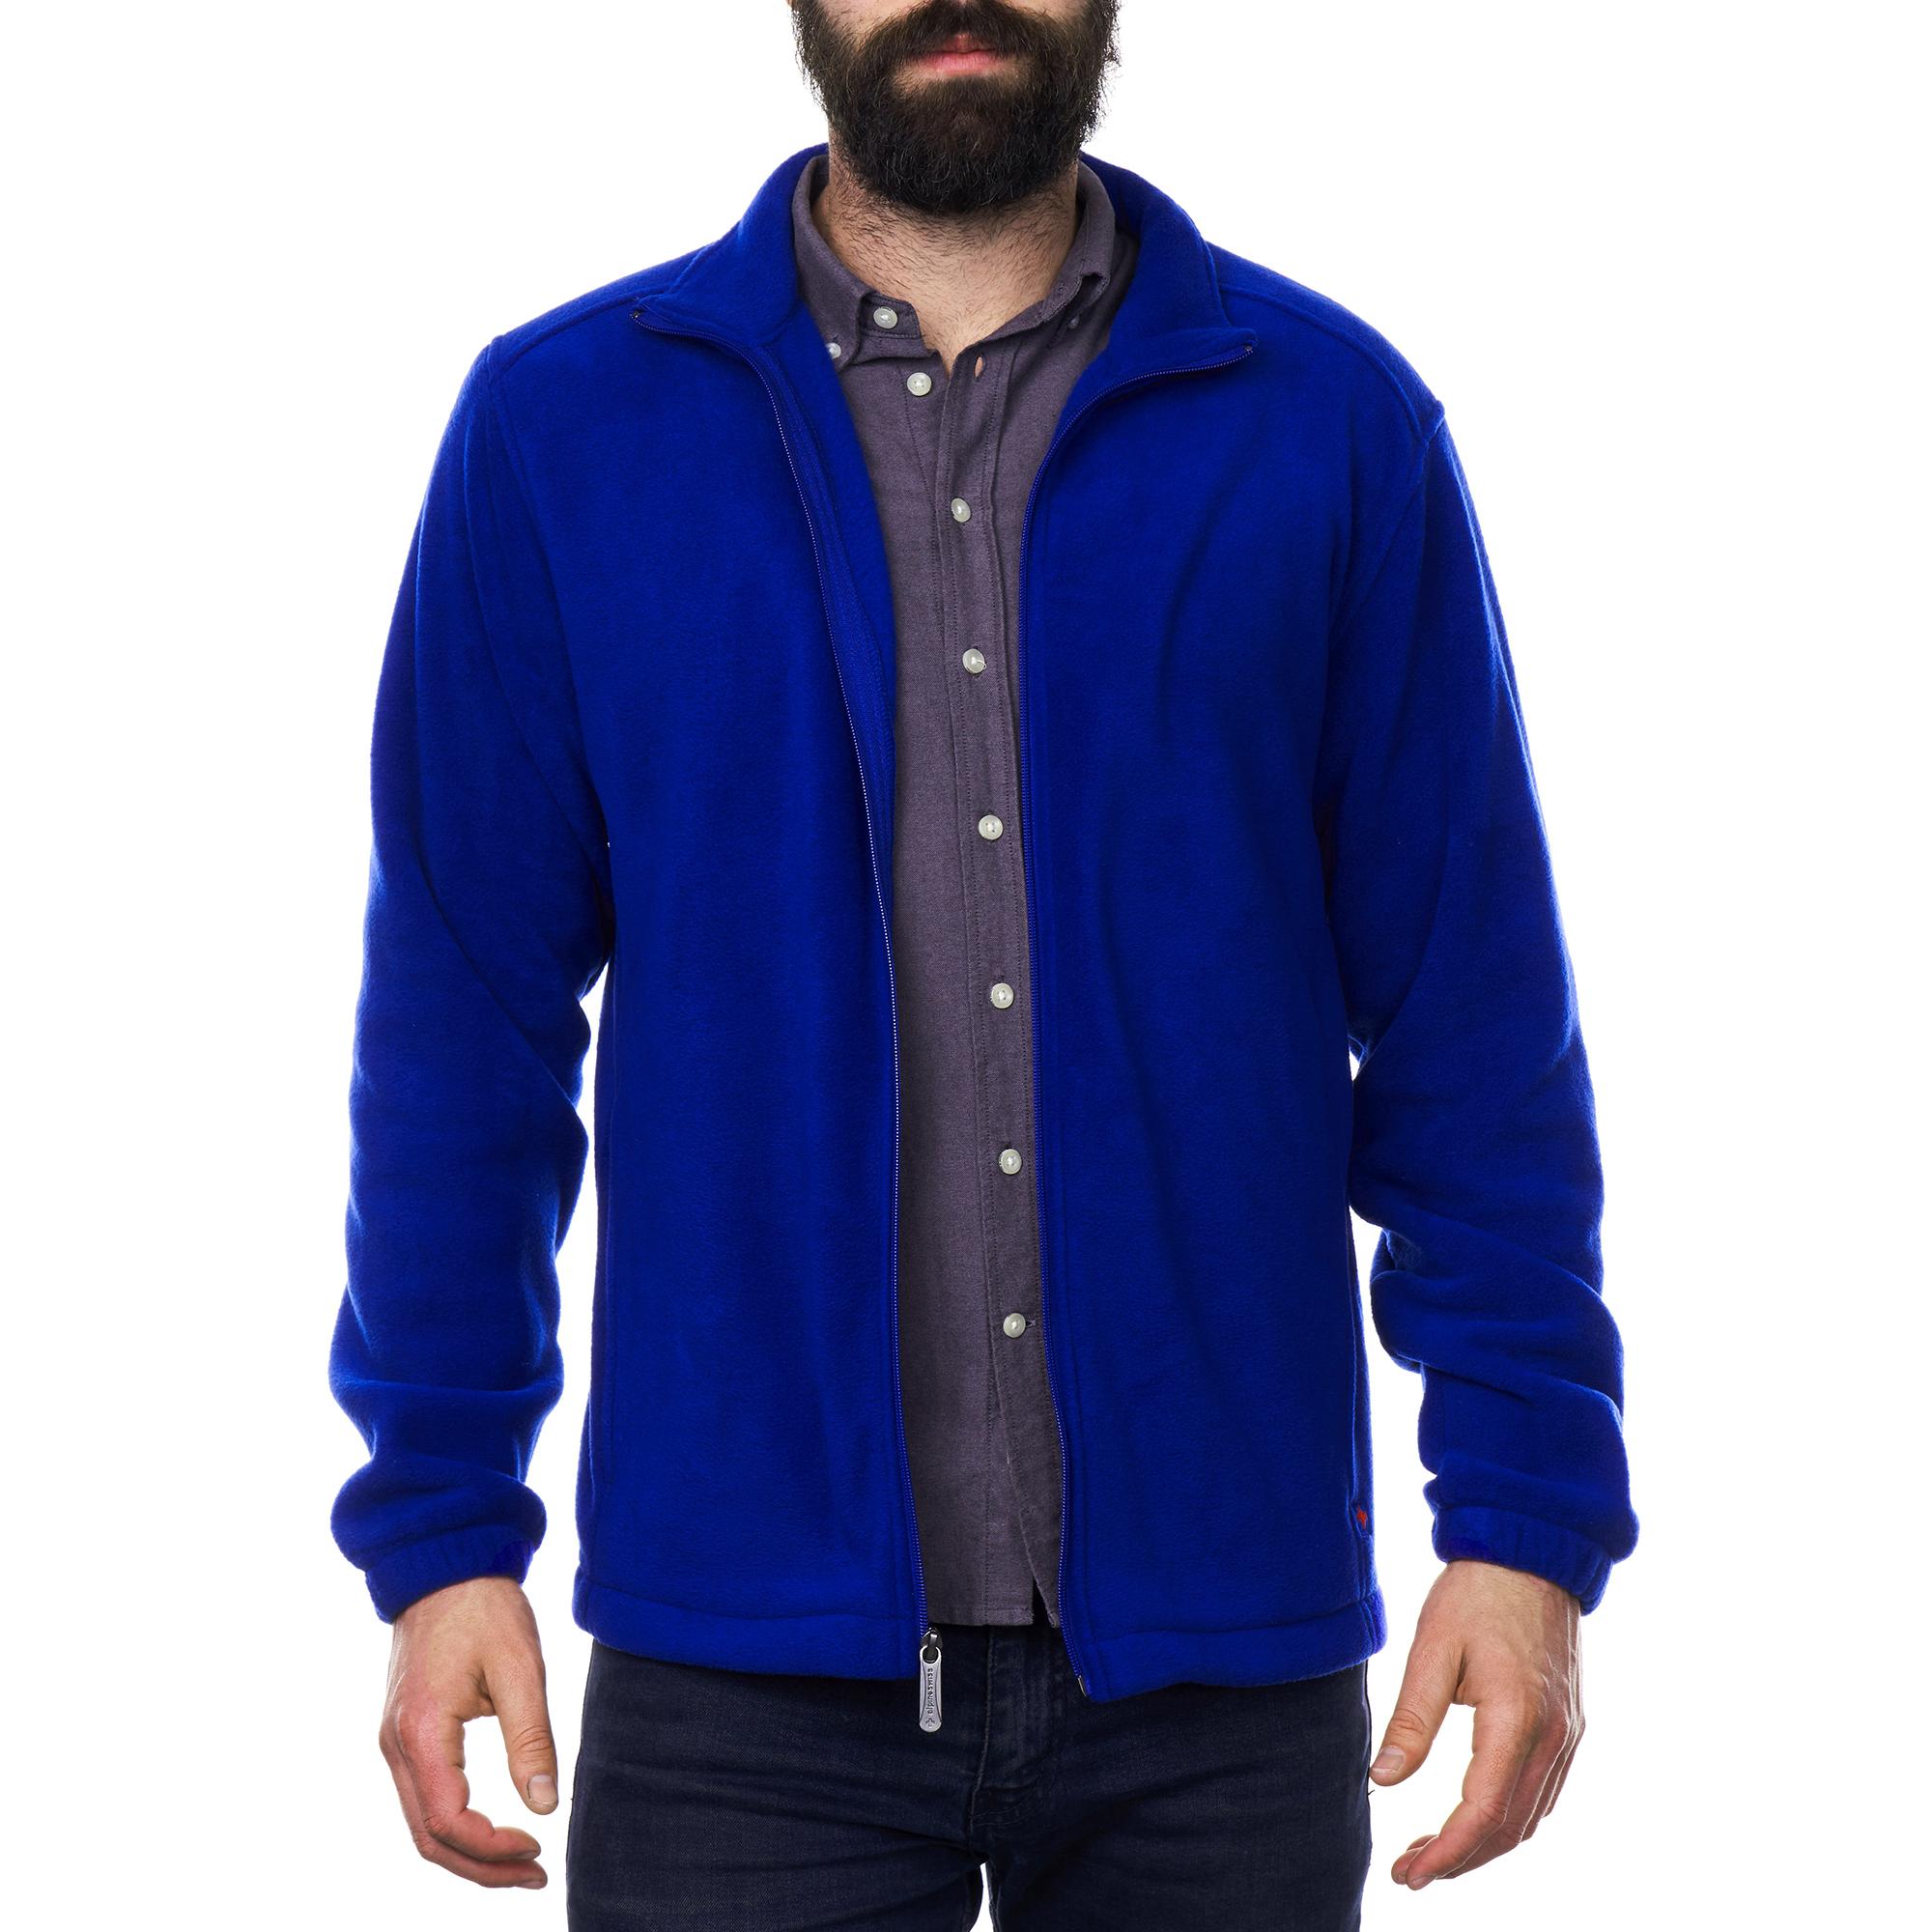 Alpine-Swiss-Trent-Mens-Full-Zip-Up-Fleece-Jacket-Soft-Casual-Warm-Zipper-Coat thumbnail 22